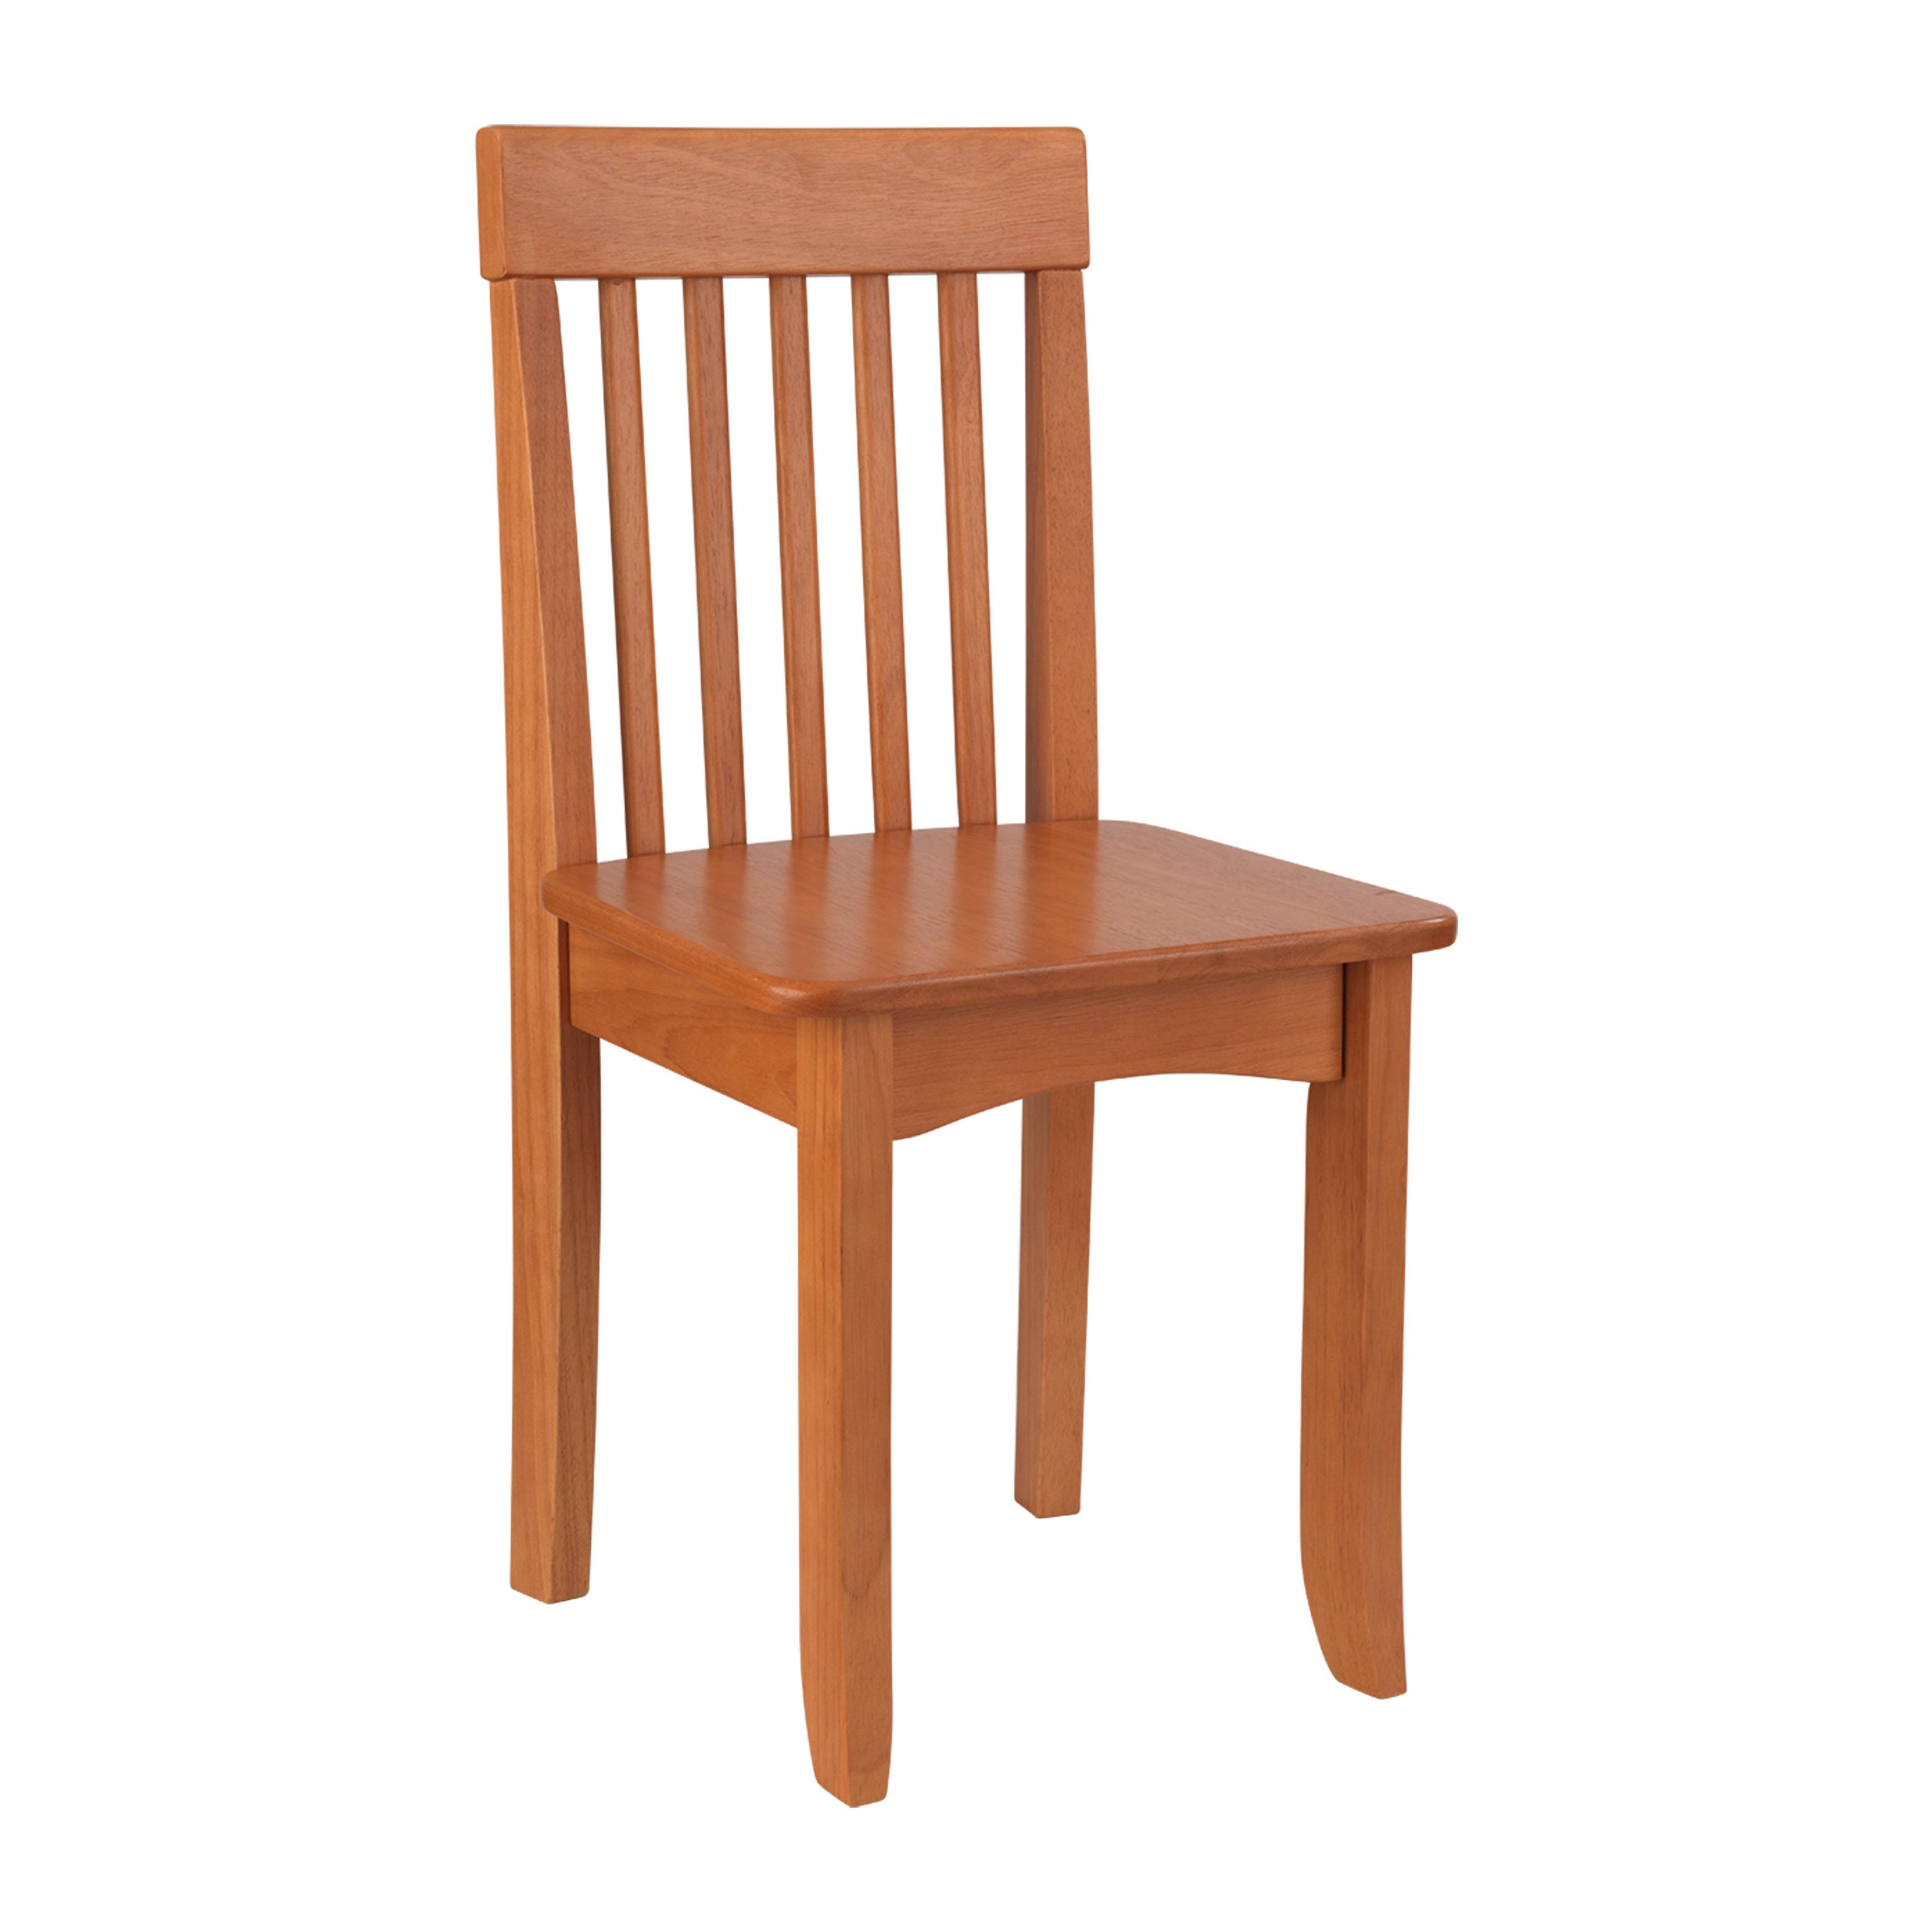 KidKraft Avalon Chair  Honey  Walmartcom